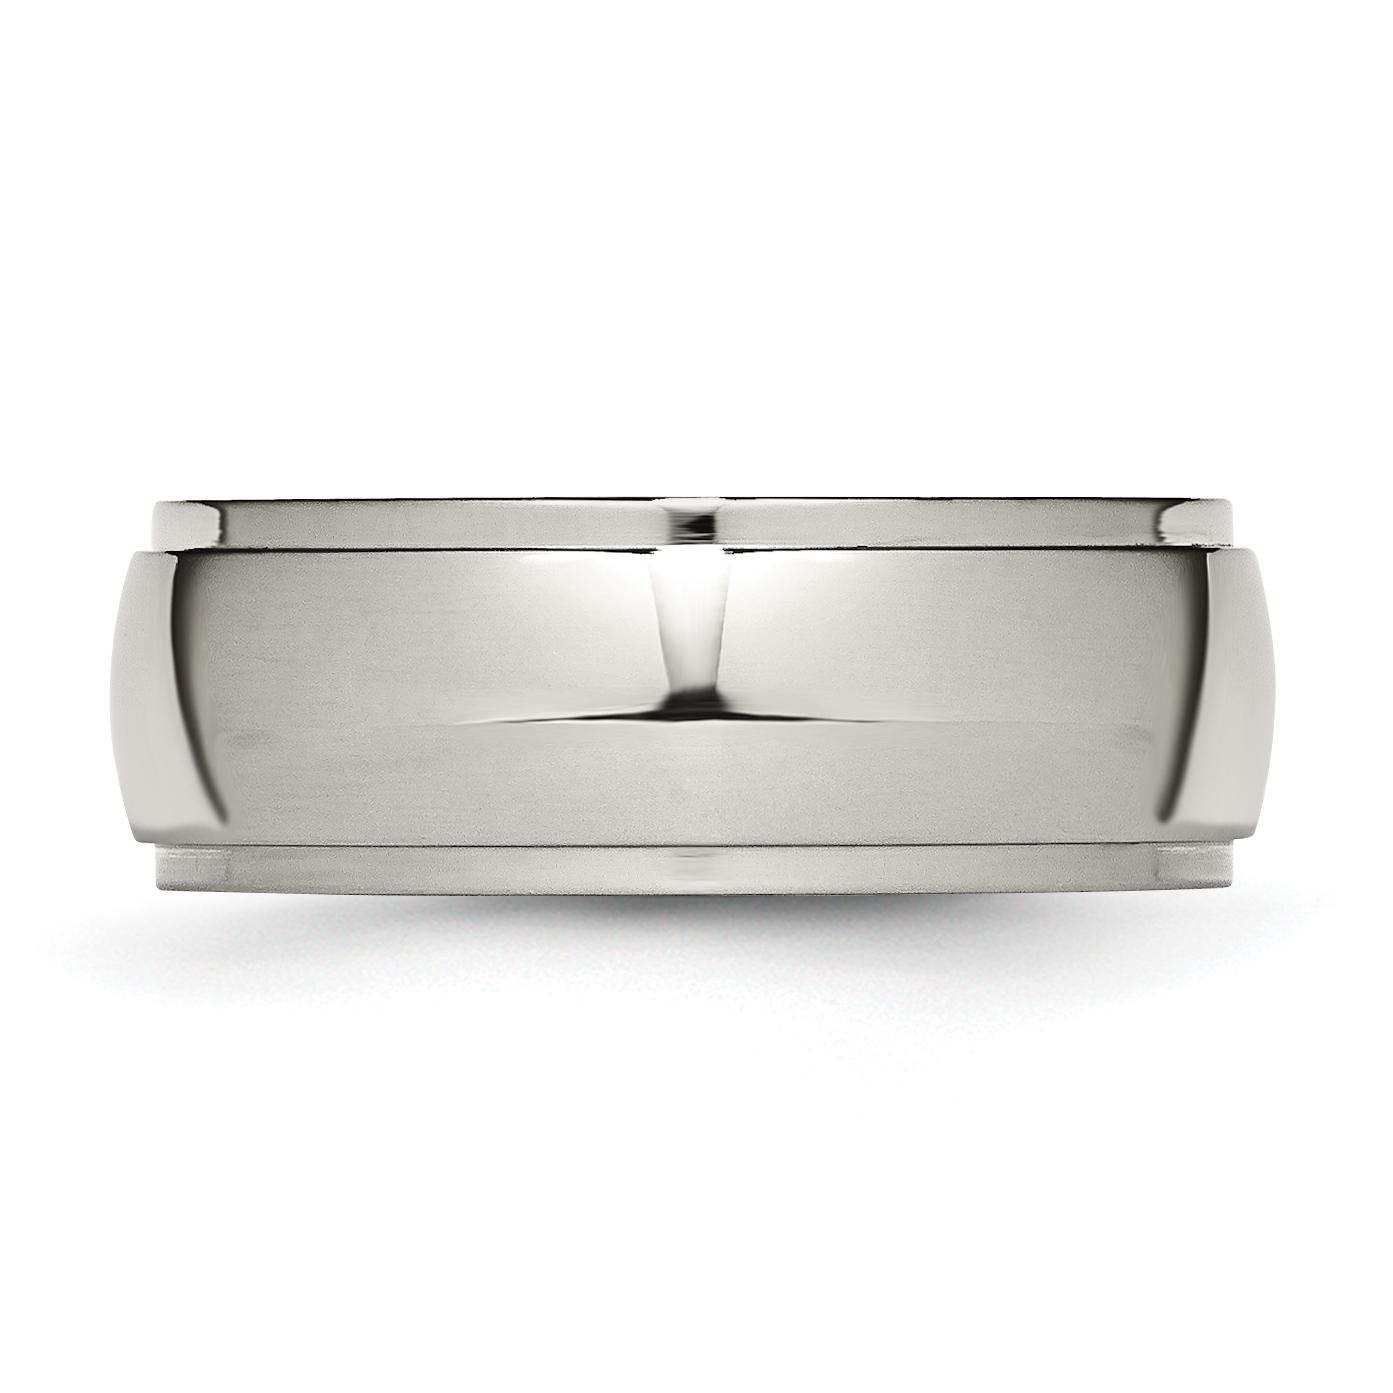 Jewelry & Watches Titanium Ridged Edge 8mm Brushed Wedding Ring Band Size 7.50 Classic Flat